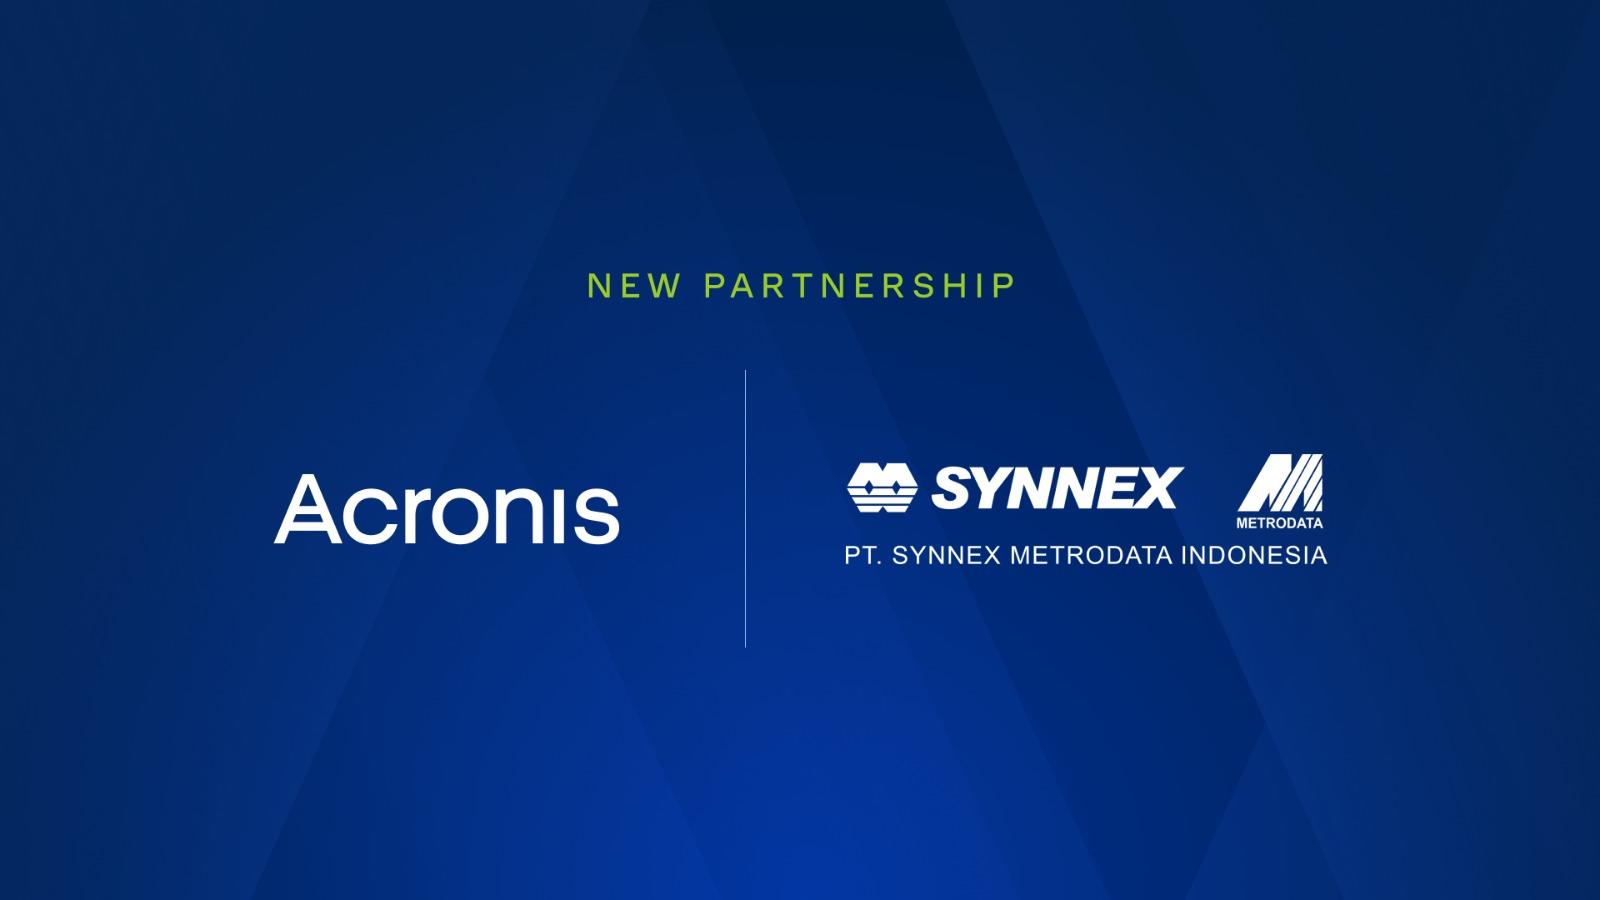 https://www.synnexmetrodata.com/wp-content/uploads/2021/08/SMI-x-Acronis-Partnership.jpeg